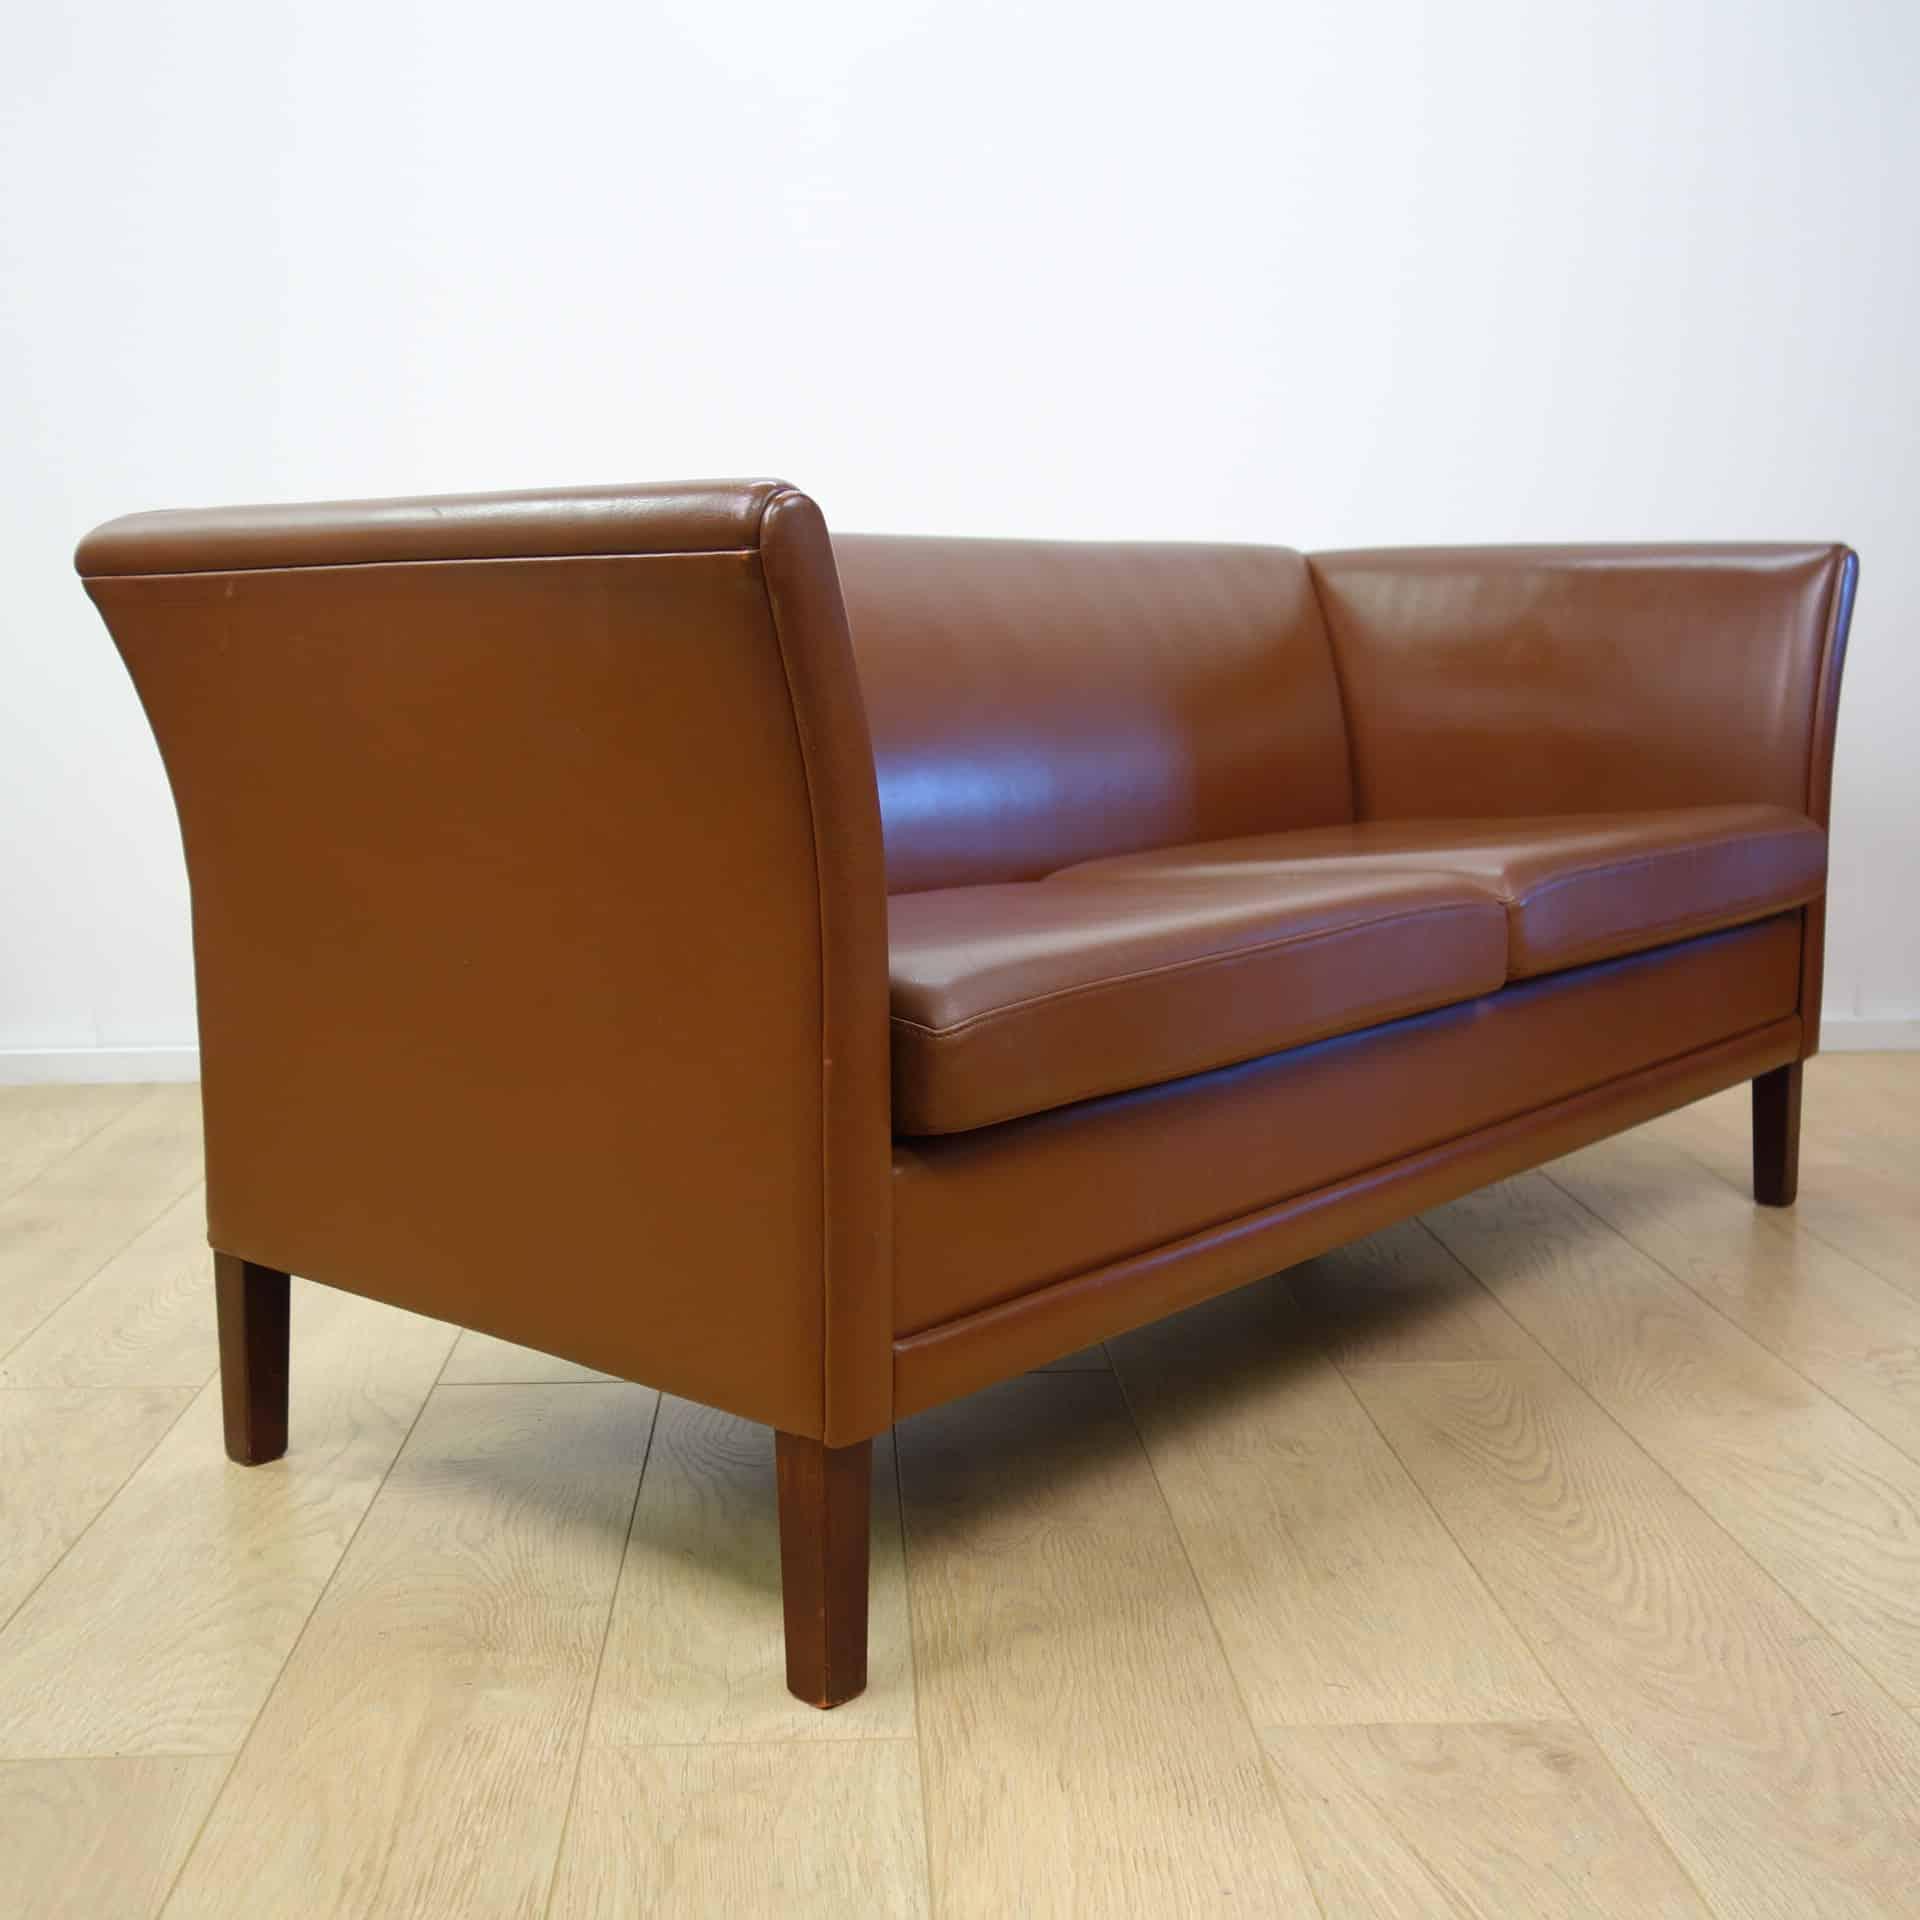 Danish Tan Leather Sofa Mark Parrish Mid Century Modern